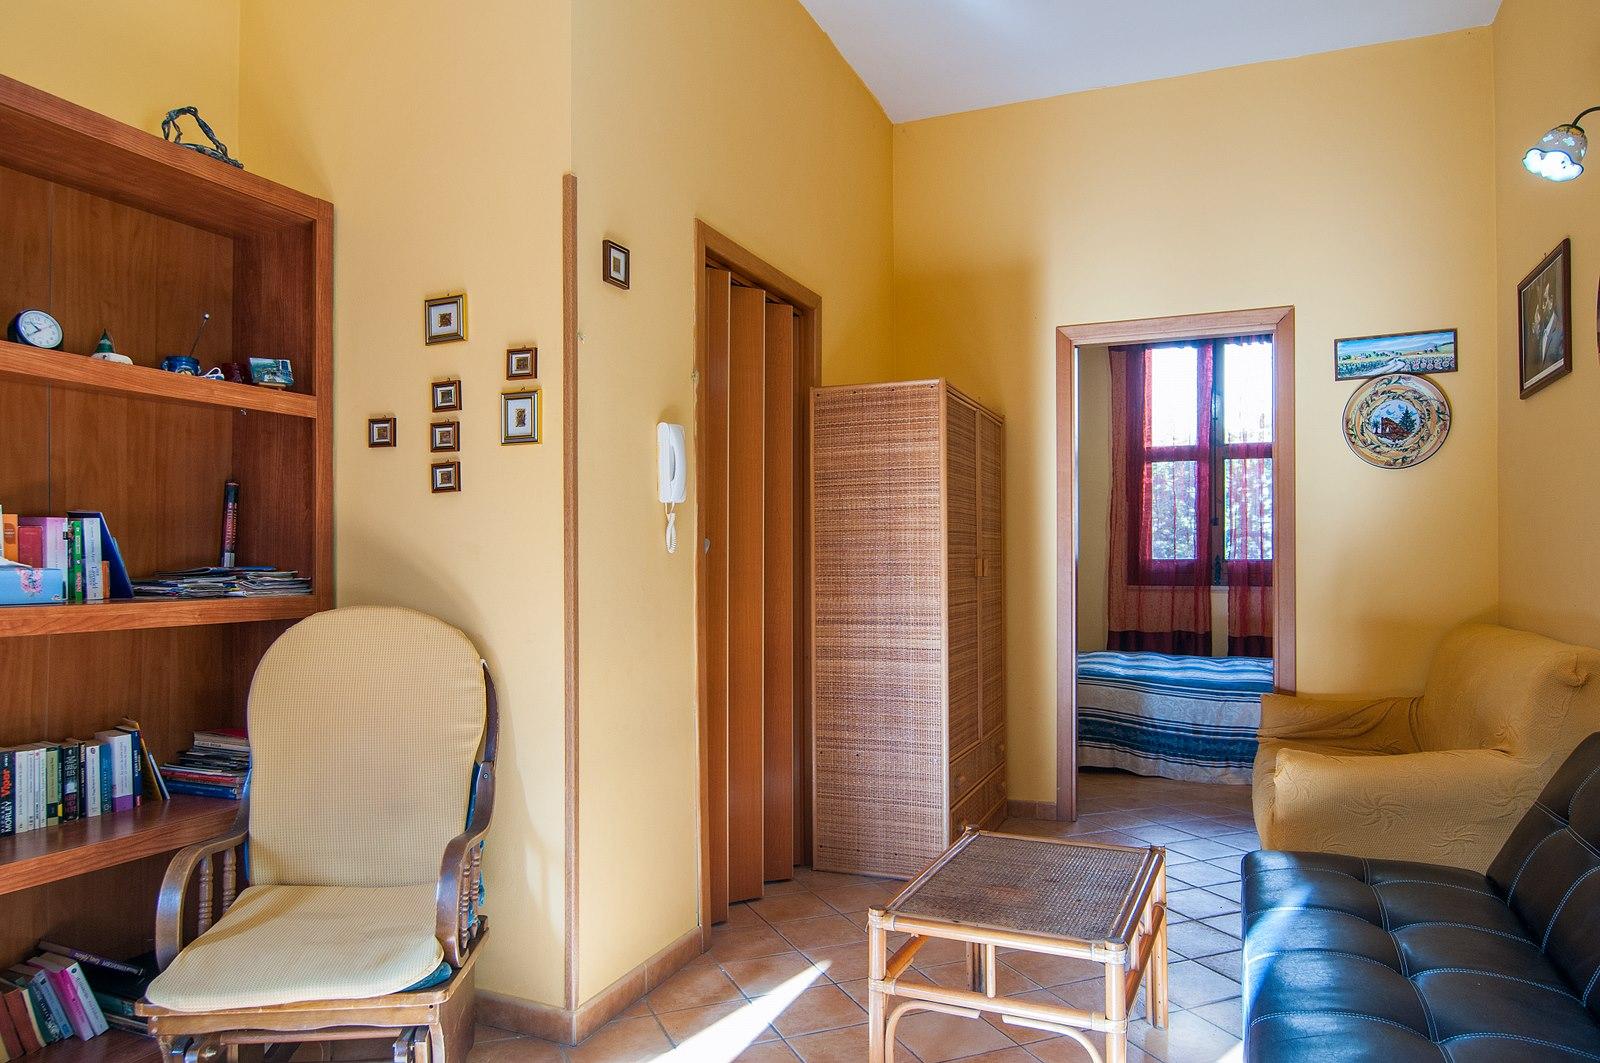 Maison de vacances Villetta a Lido (1540086), Lido di Noto, Siracusa, Sicile, Italie, image 15